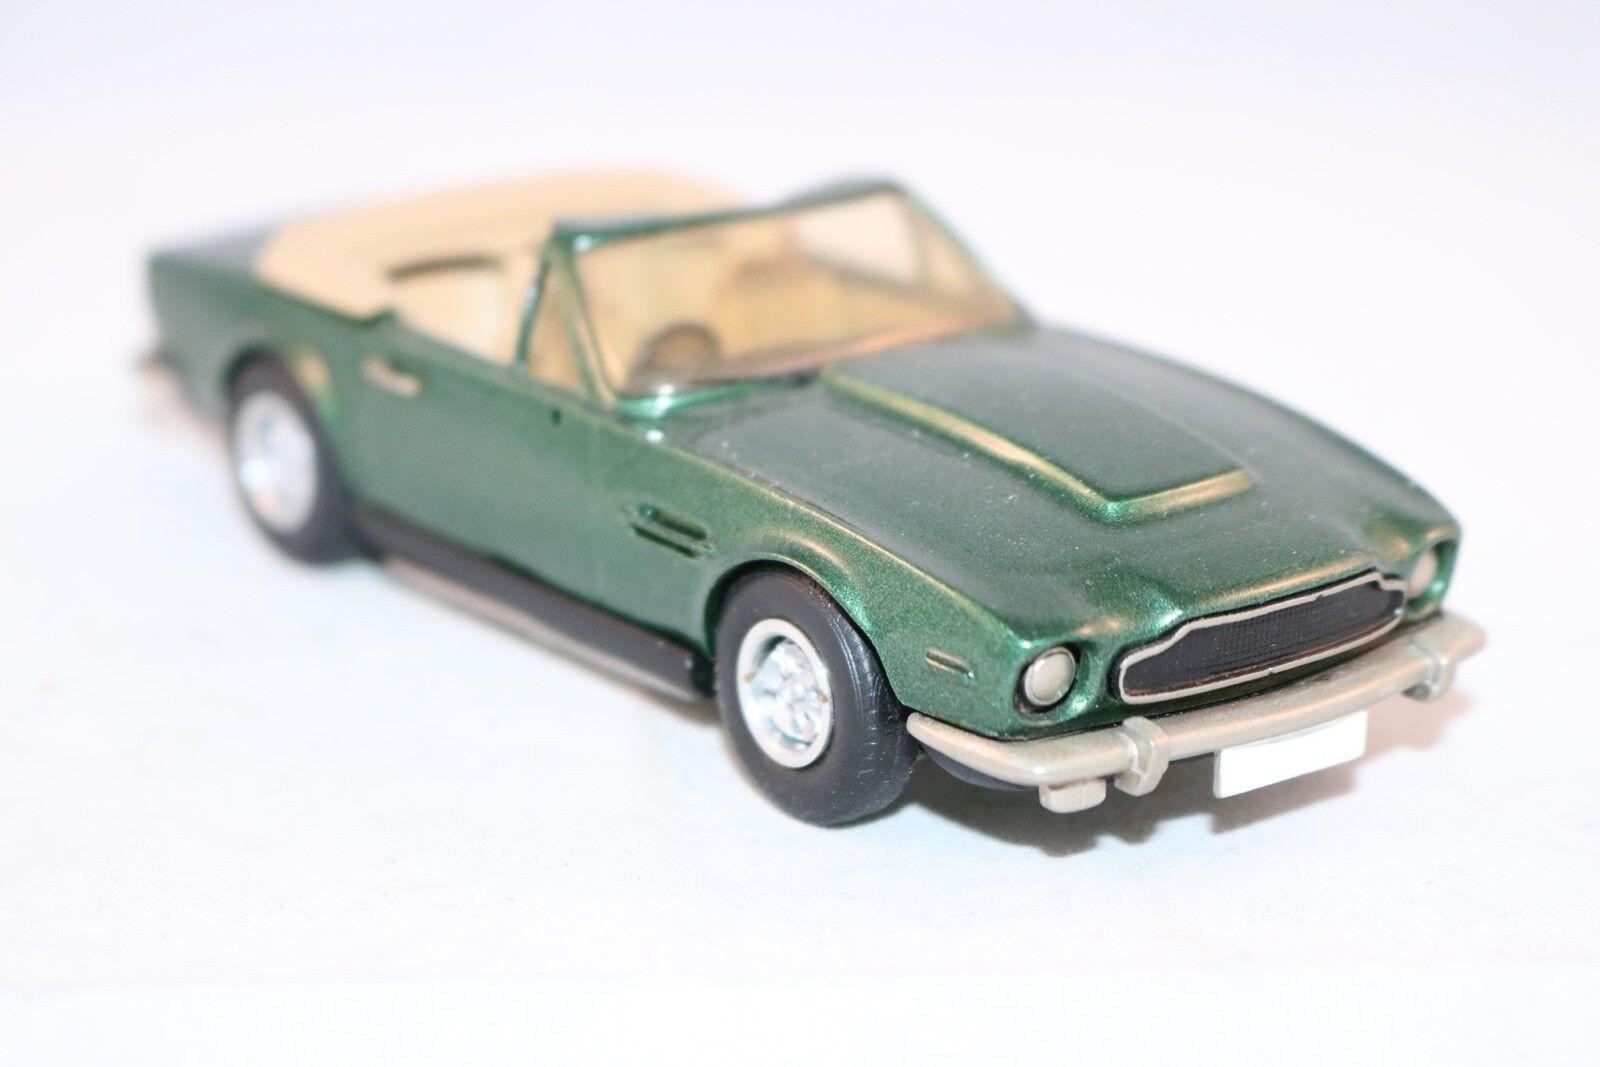 Western Models Aston Martin V8  in mint condition in in in 1 43 ea7cf0